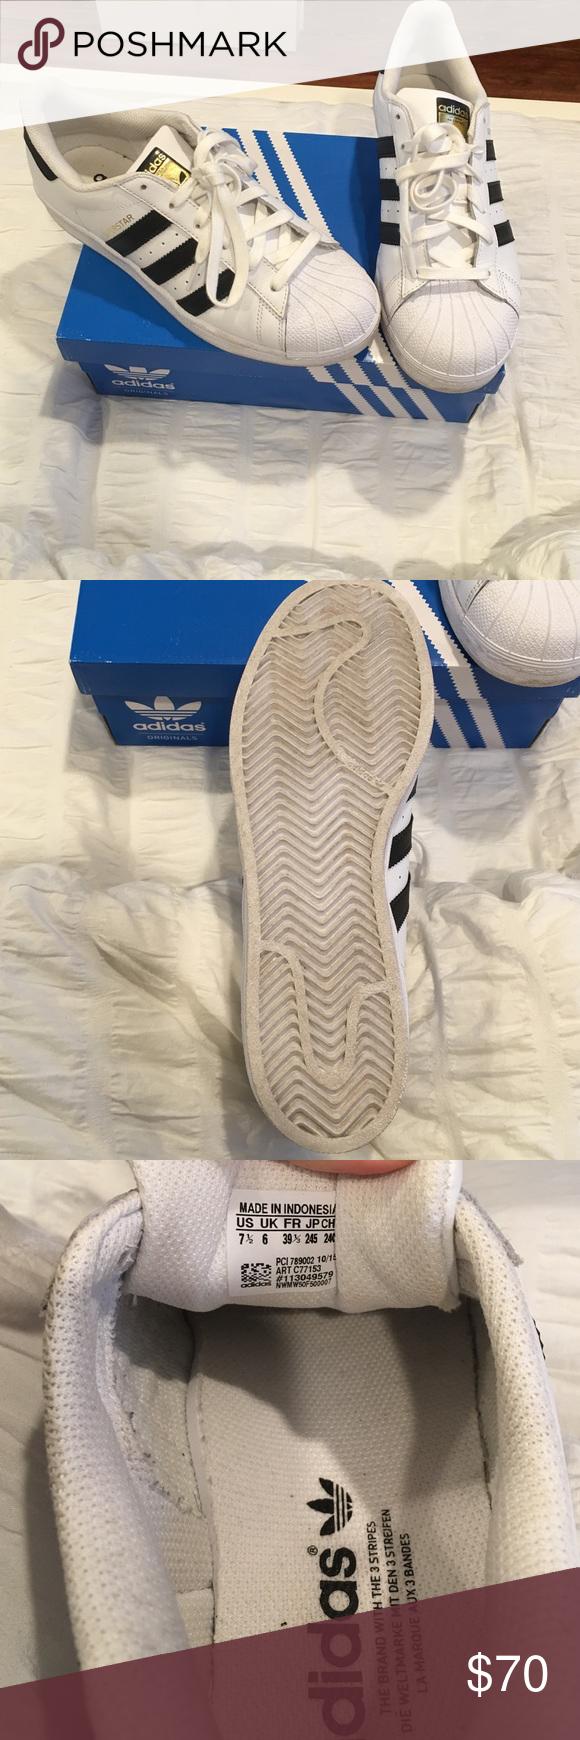 adidas super star scarpe adidas, le adidas e scarpe da ginnastica